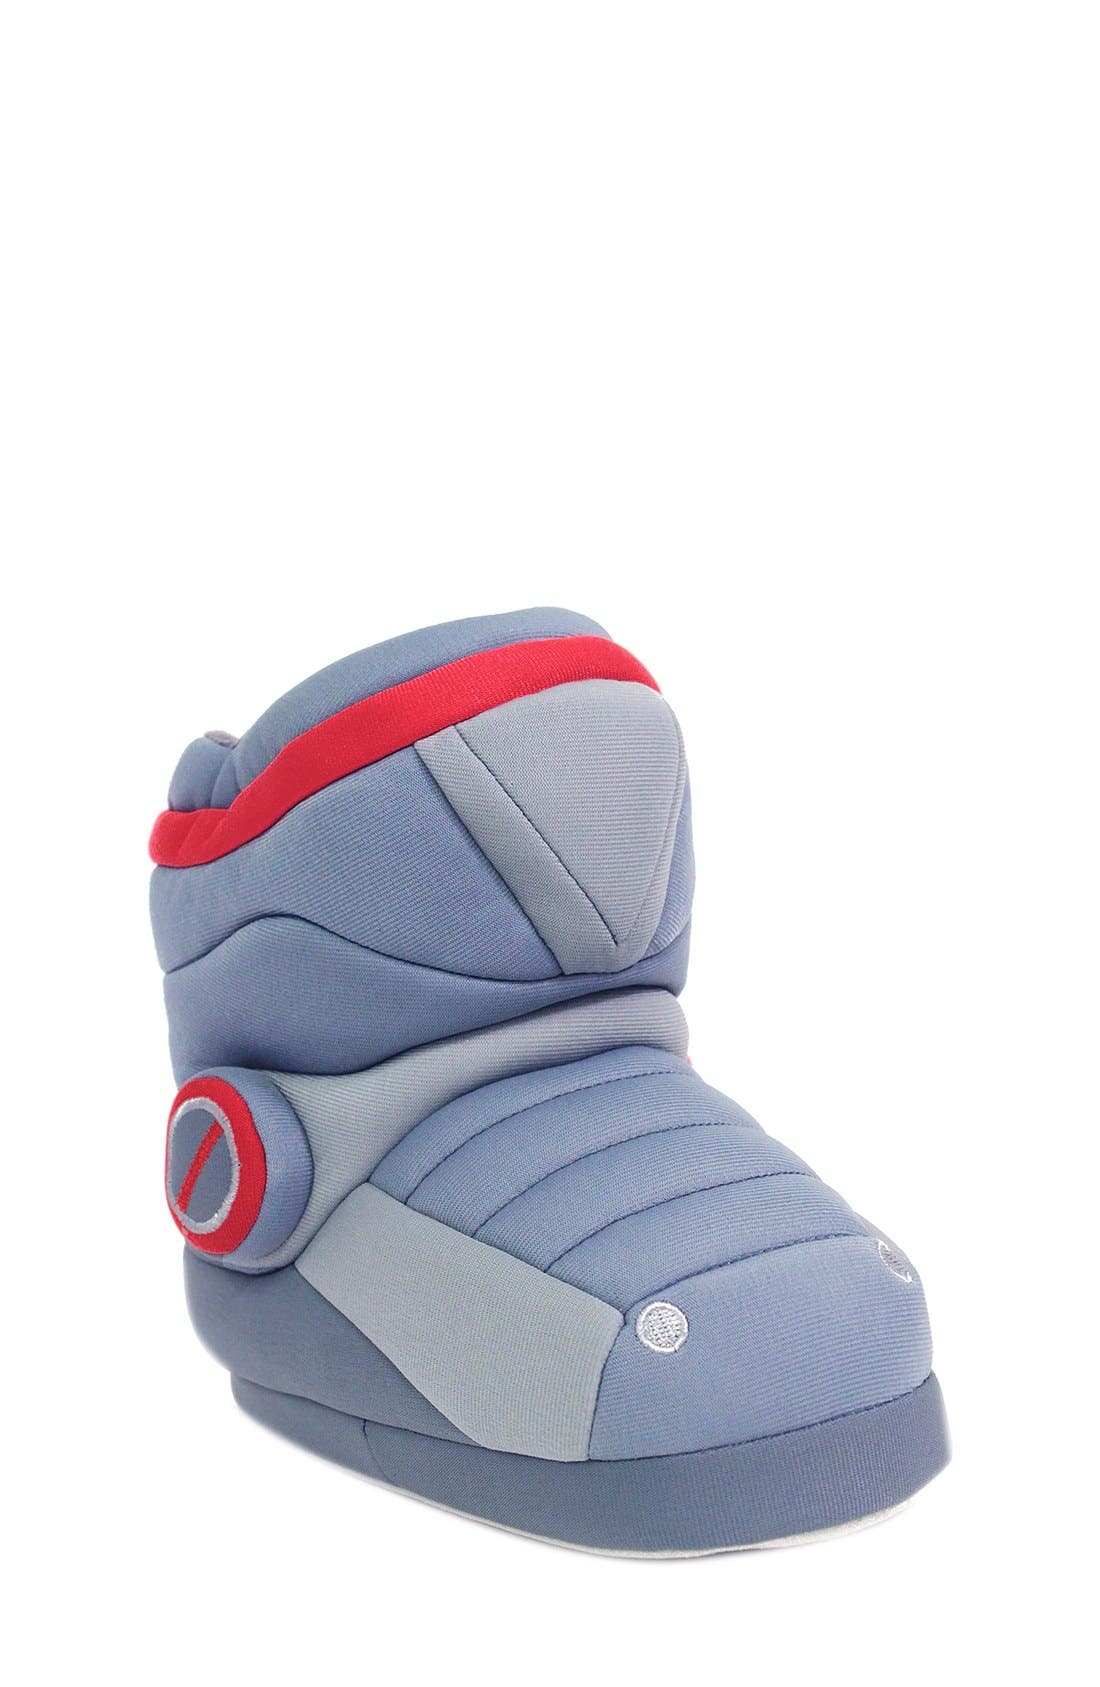 Robot Slipper Boot,                         Main,                         color, 020